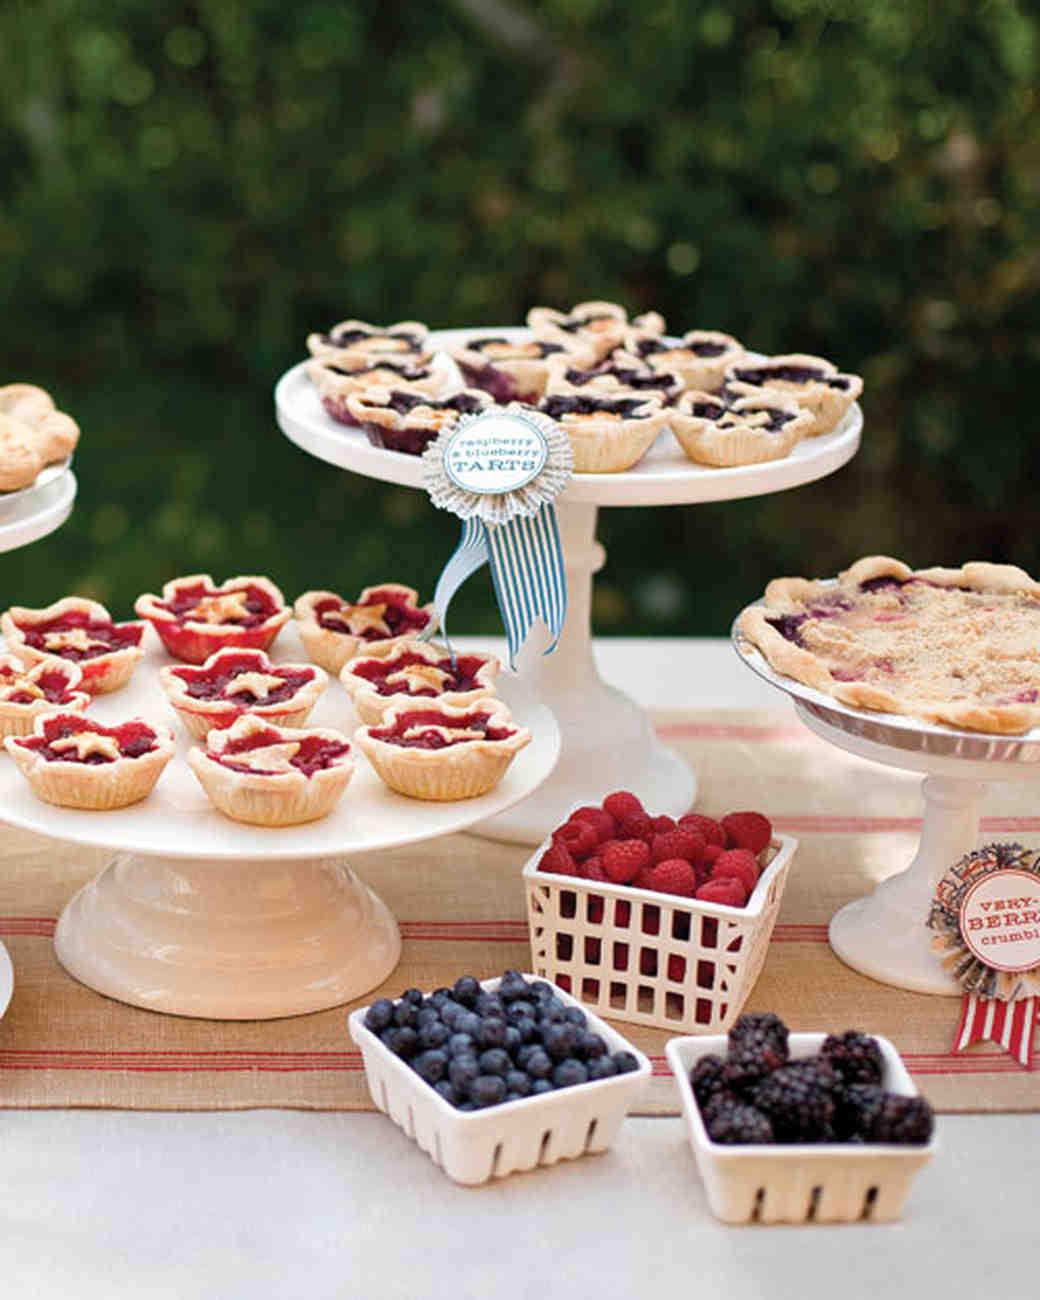 dessert table ideas from real weddings martha stewart weddings rh marthastewartweddings com Wedding Buffet Decorating Ideas rustic wedding dessert bar ideas